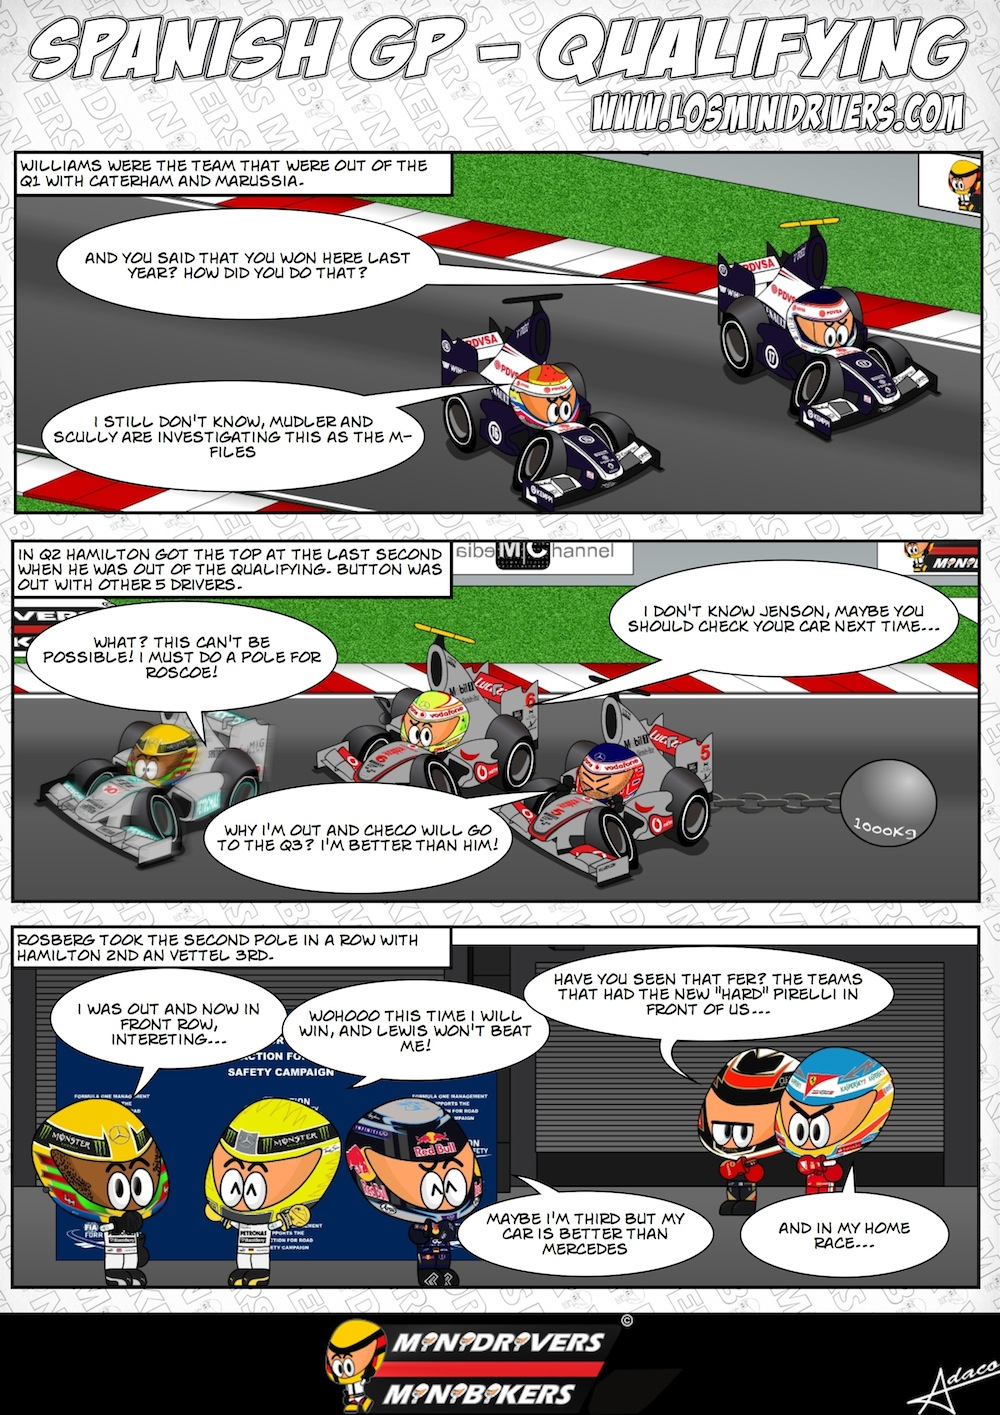 комикс MiniDrivers по квалификации на Гран-при Испании 2013